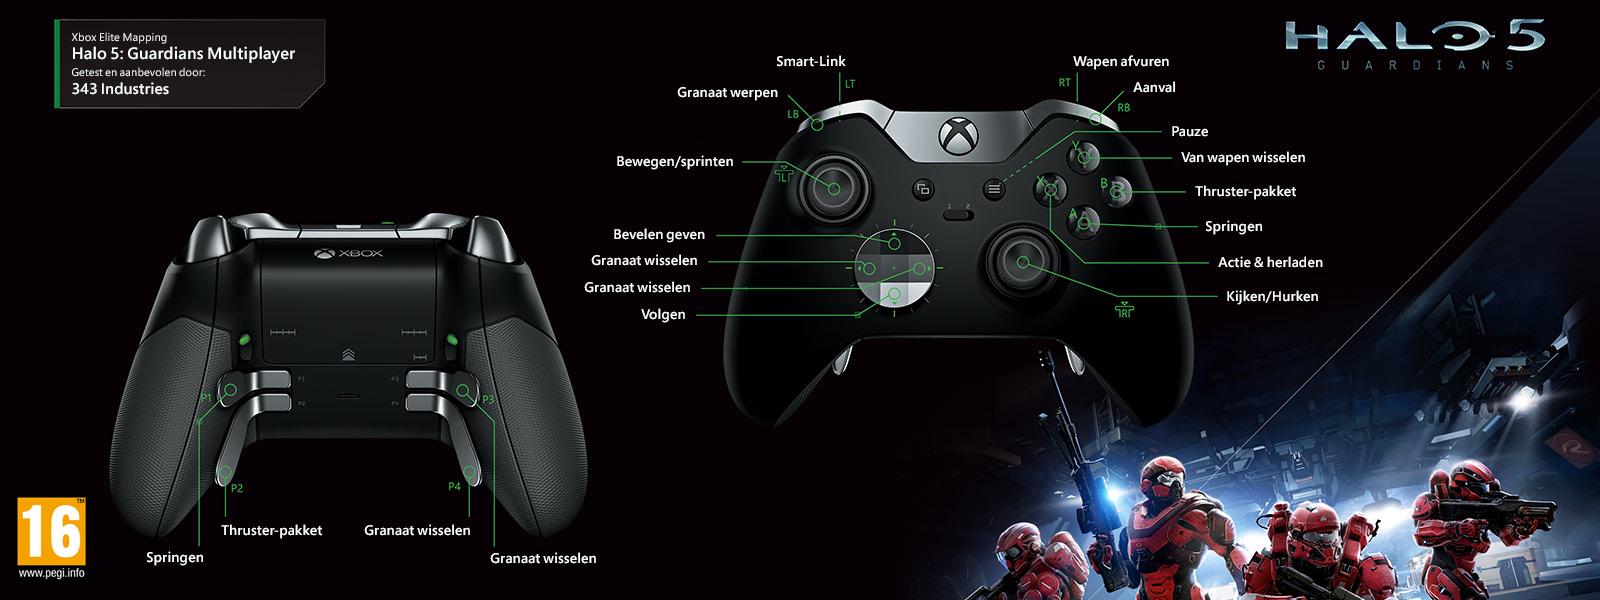 Halo 5: Guardians - Elite-mapping voor multiplayer